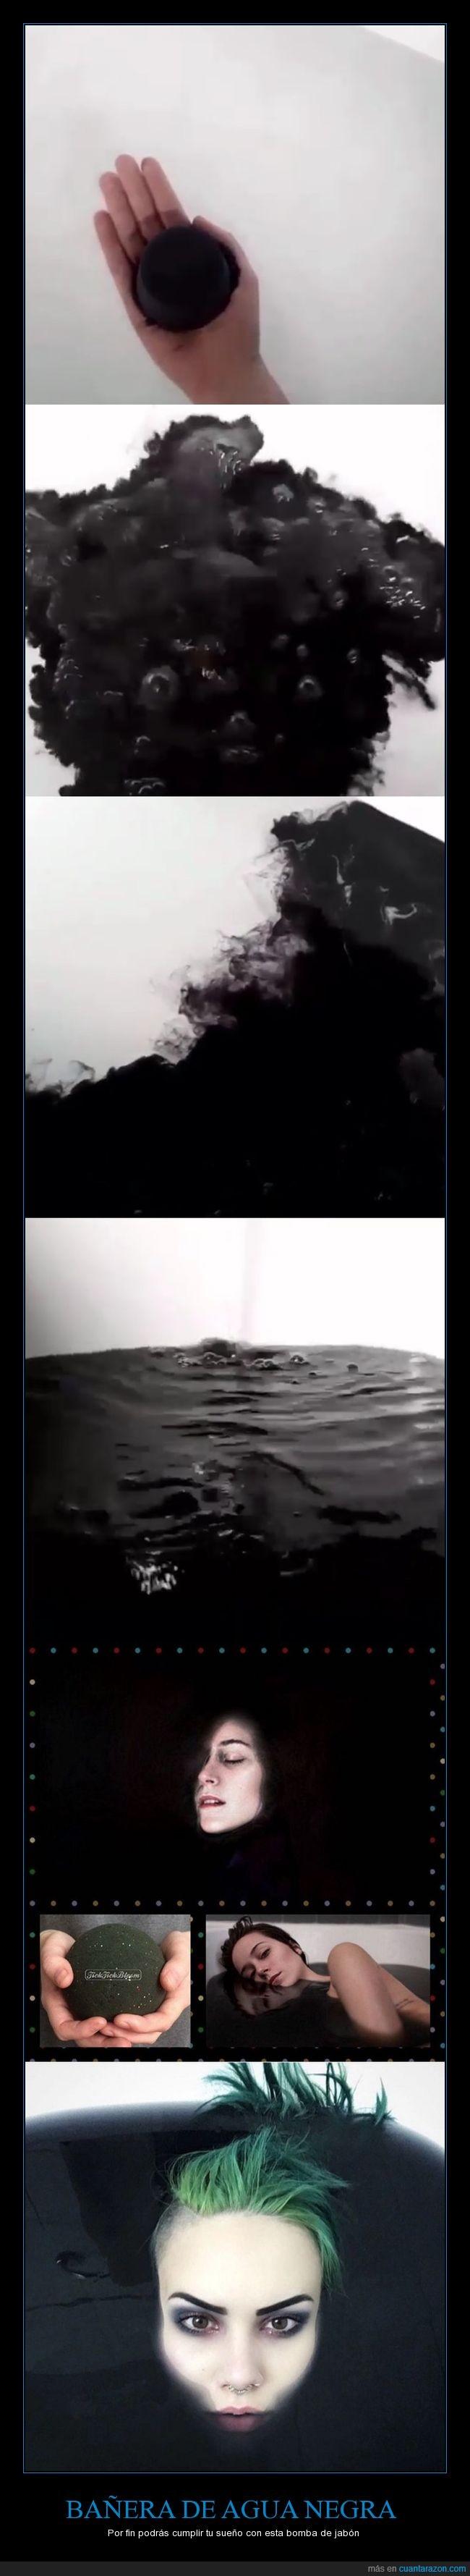 agua negra,bañera,bomba